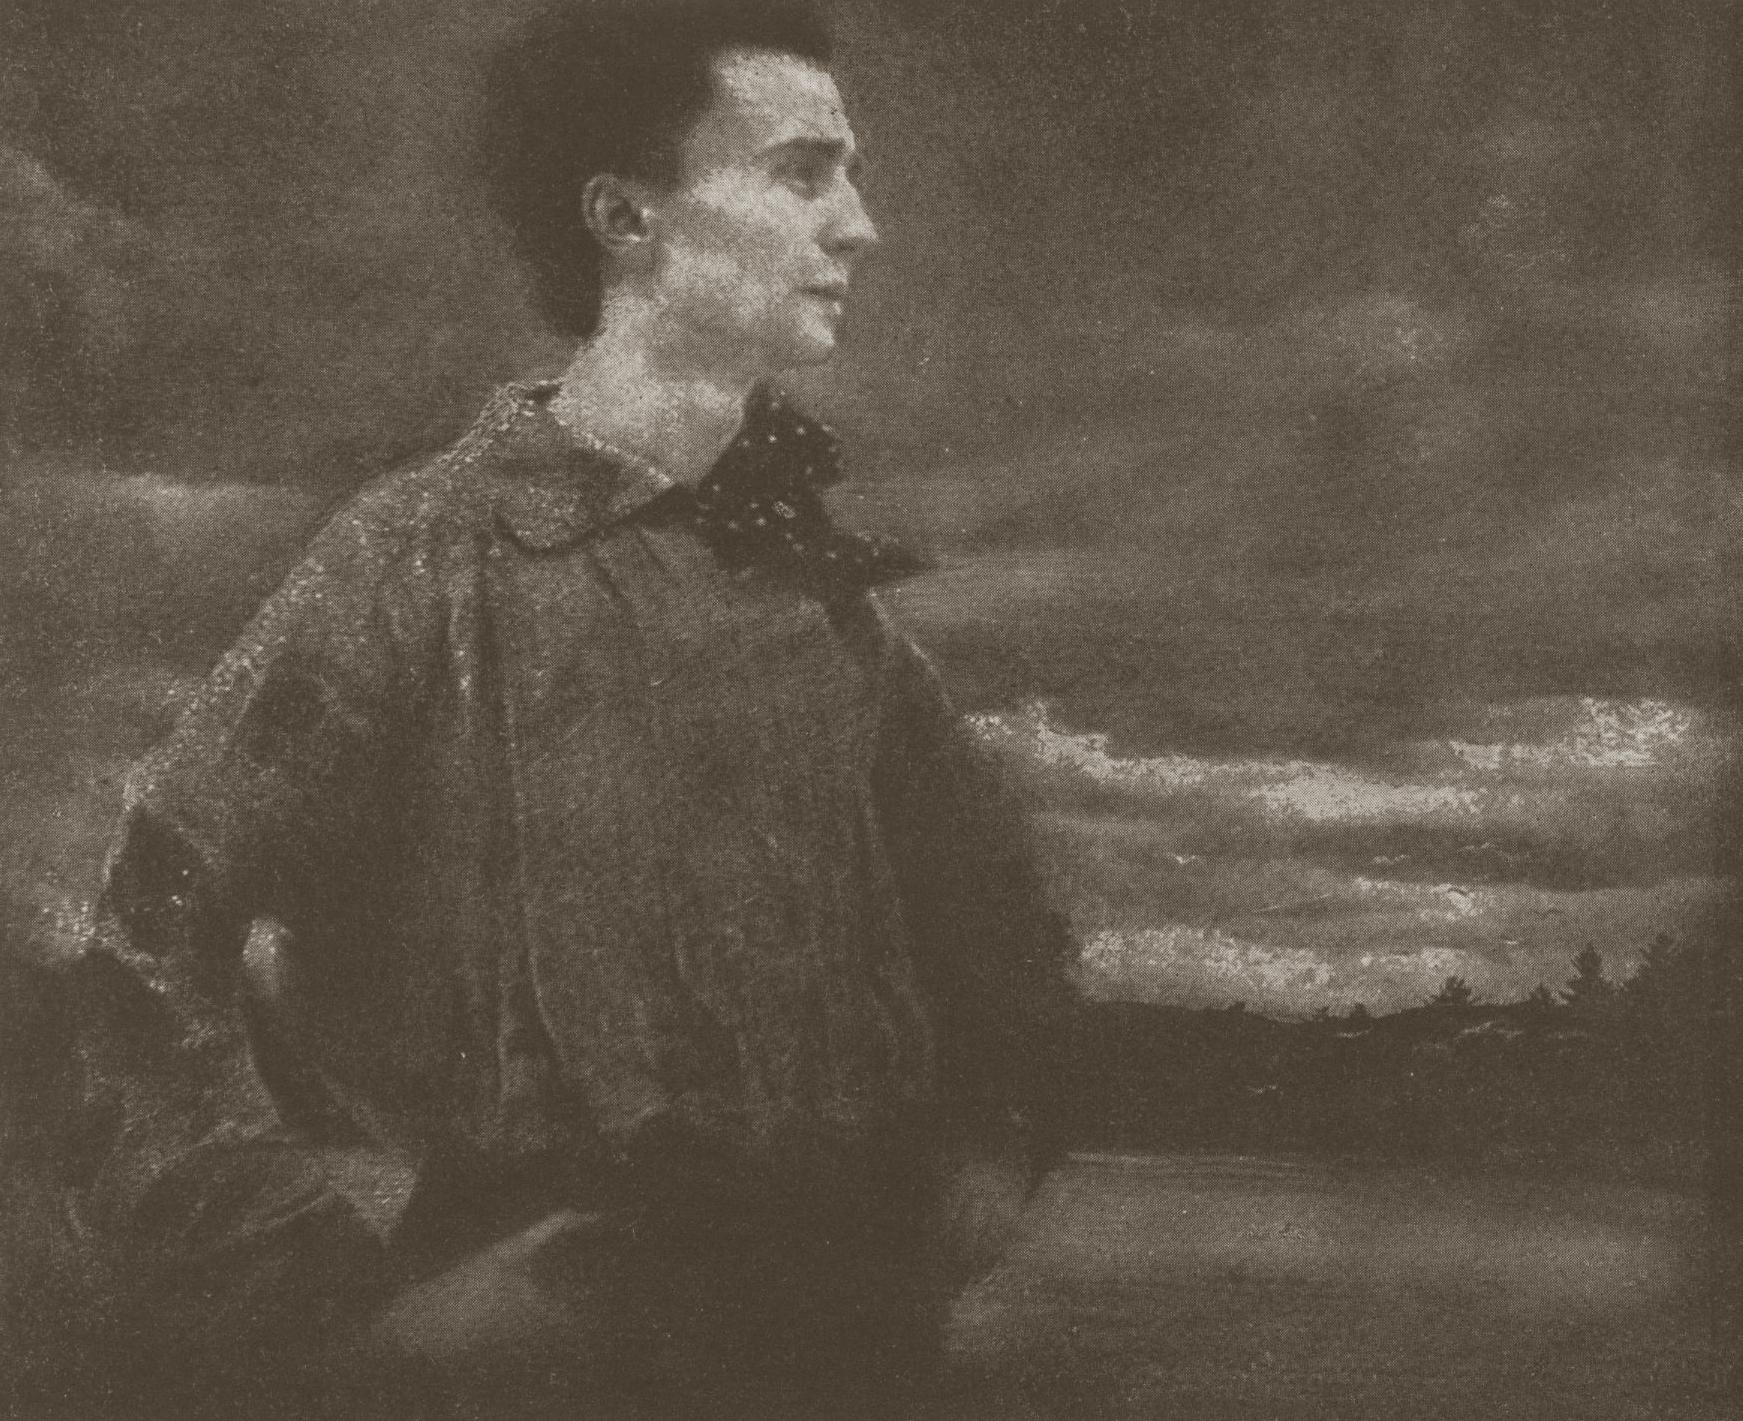 EDWARD STEICHEN, Portrait of a Young Man (Self-Portrait), 1905